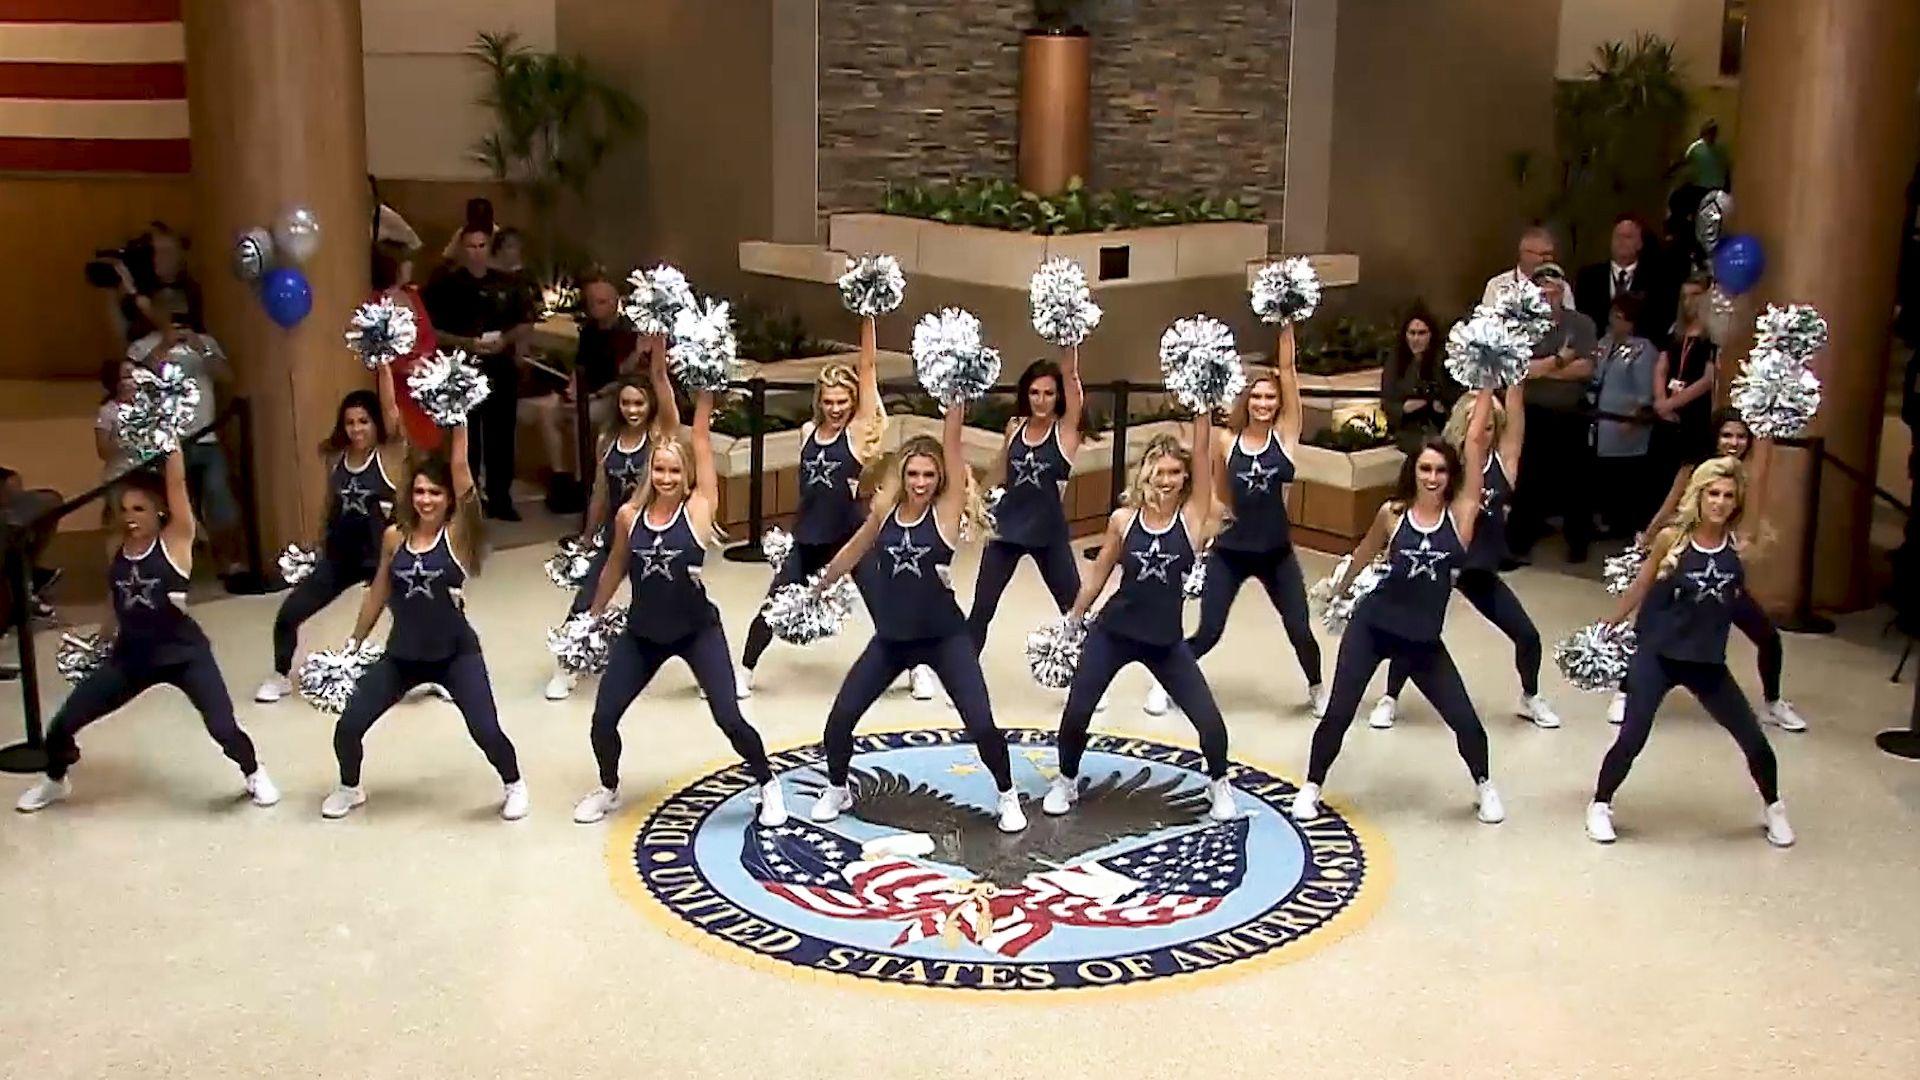 Dallas Cowboys Cheerleaders: Making The Team | Season 14